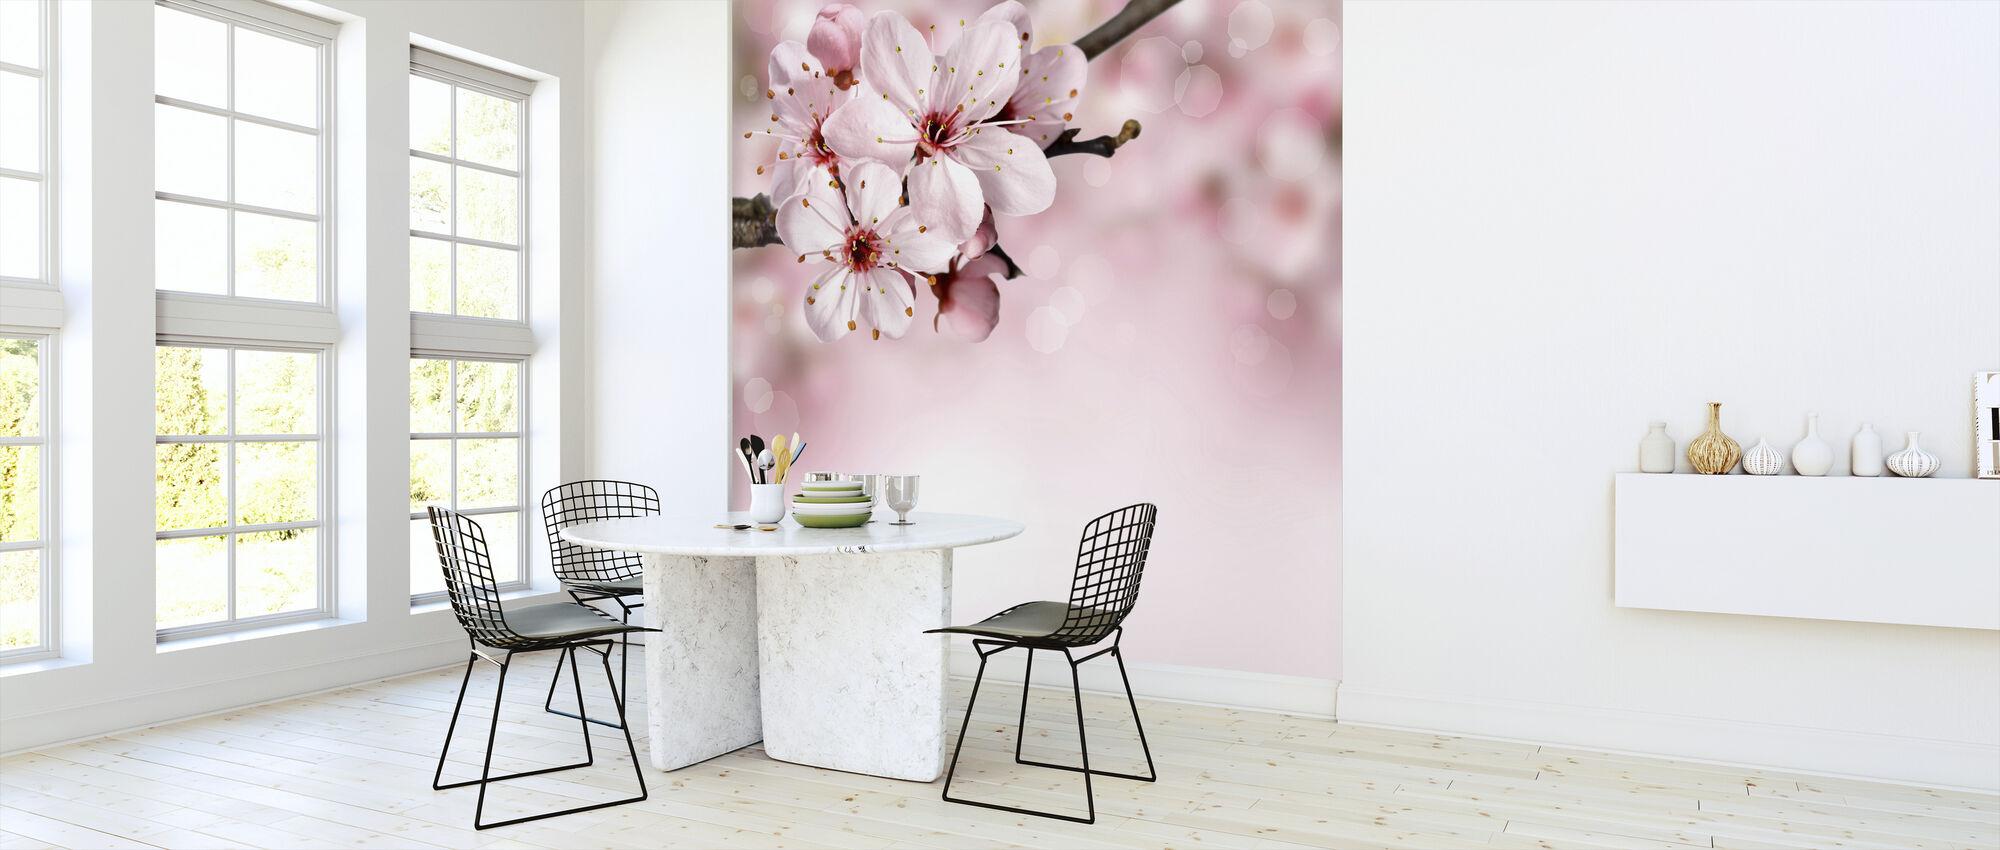 Lente grens kersenbloesem - Behang - Keuken